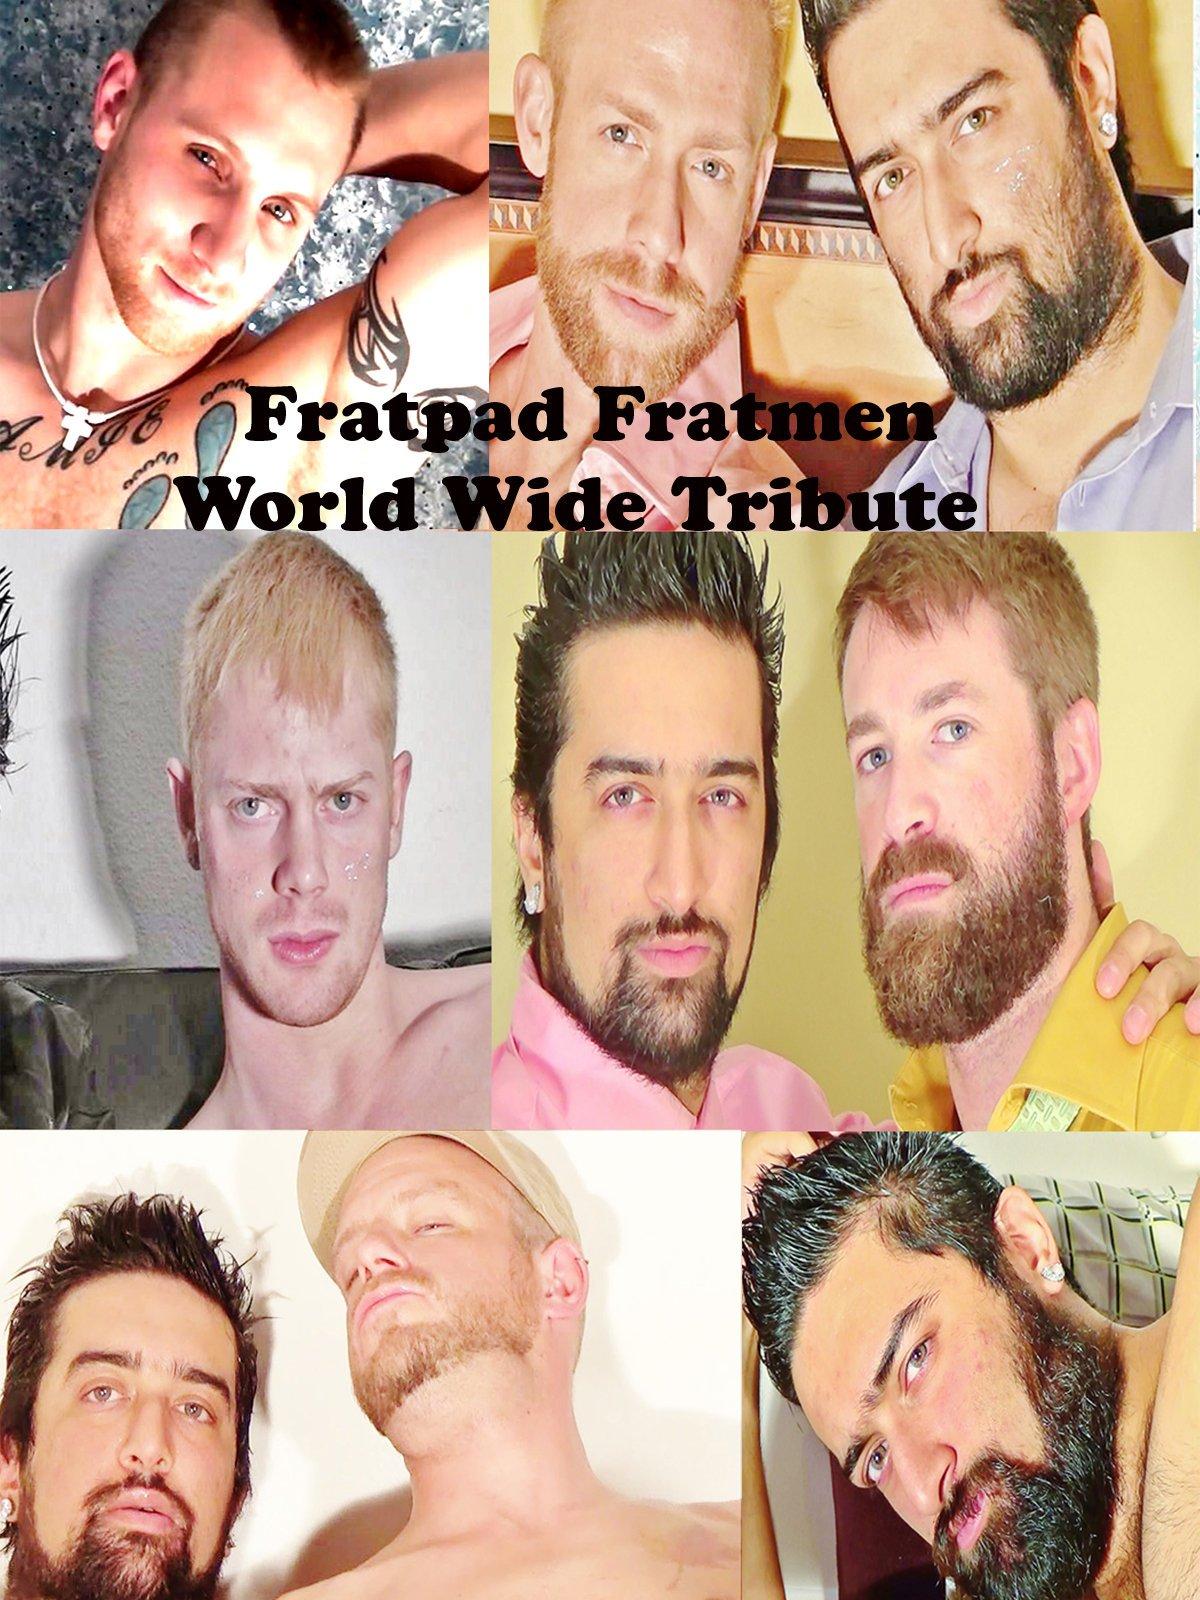 Free fratpad videos